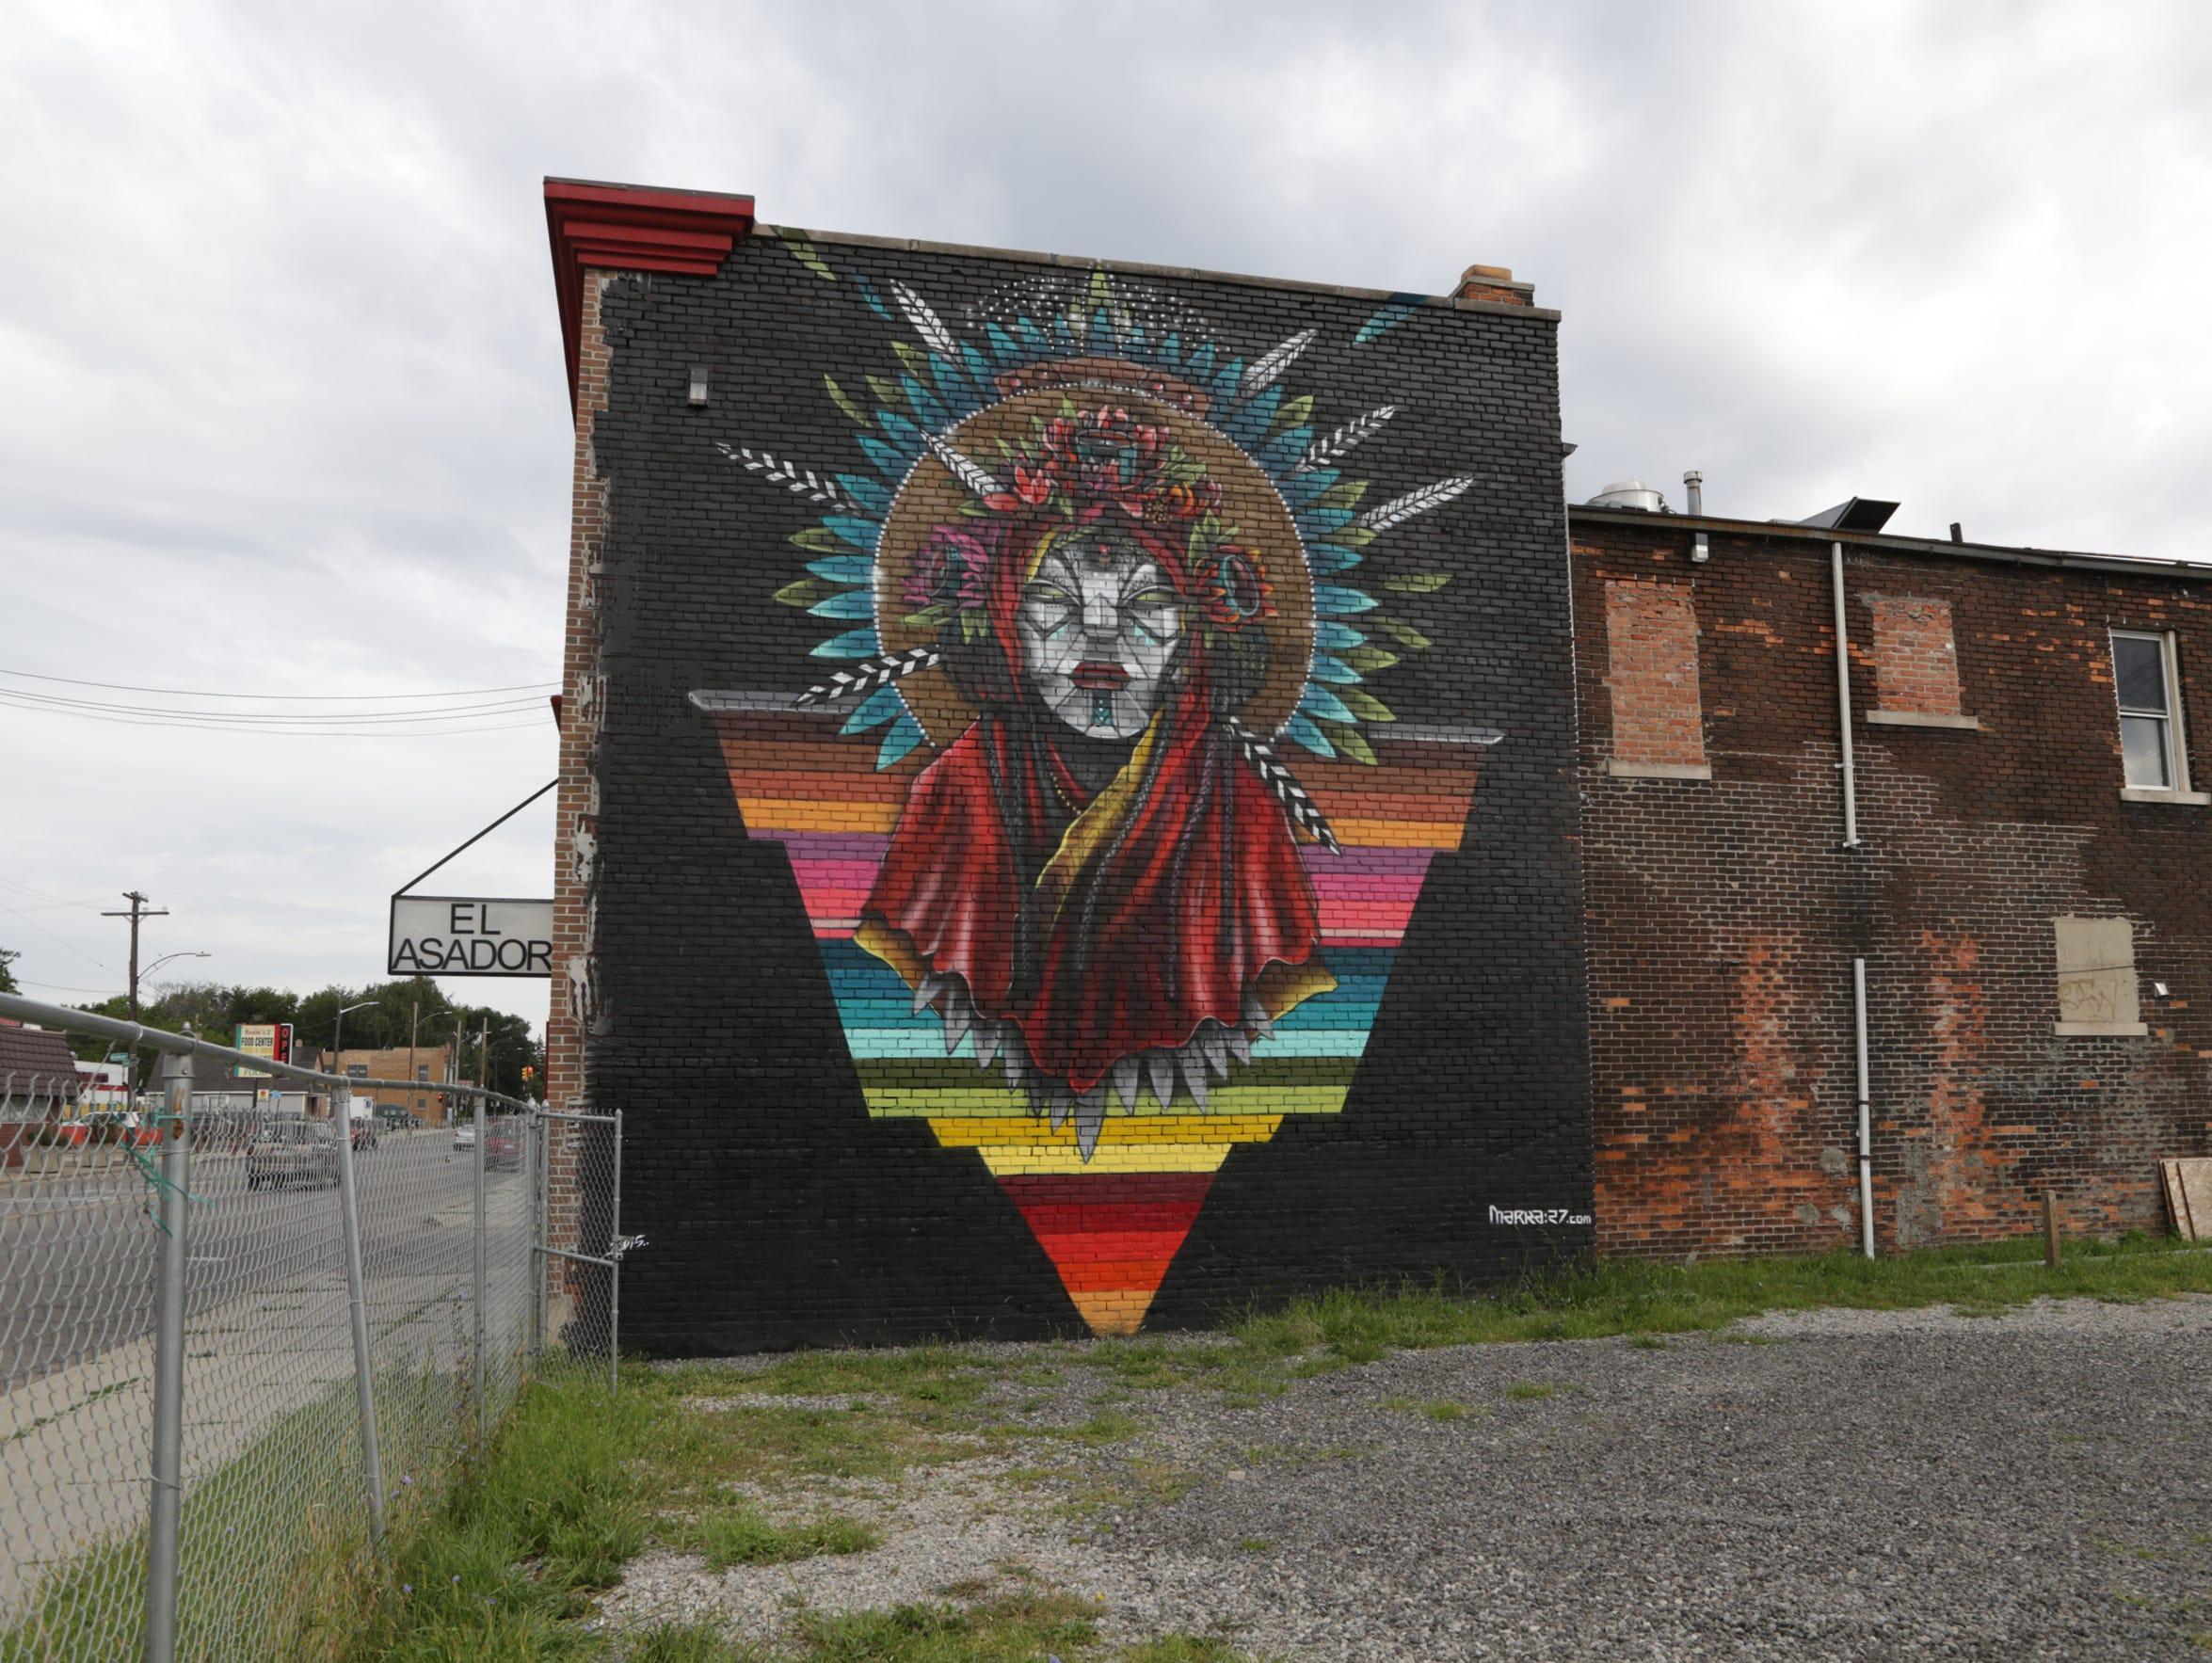 Detroit Street Art Mustsee Pieces - Spanish street artist transforms building facades into amazing artworks